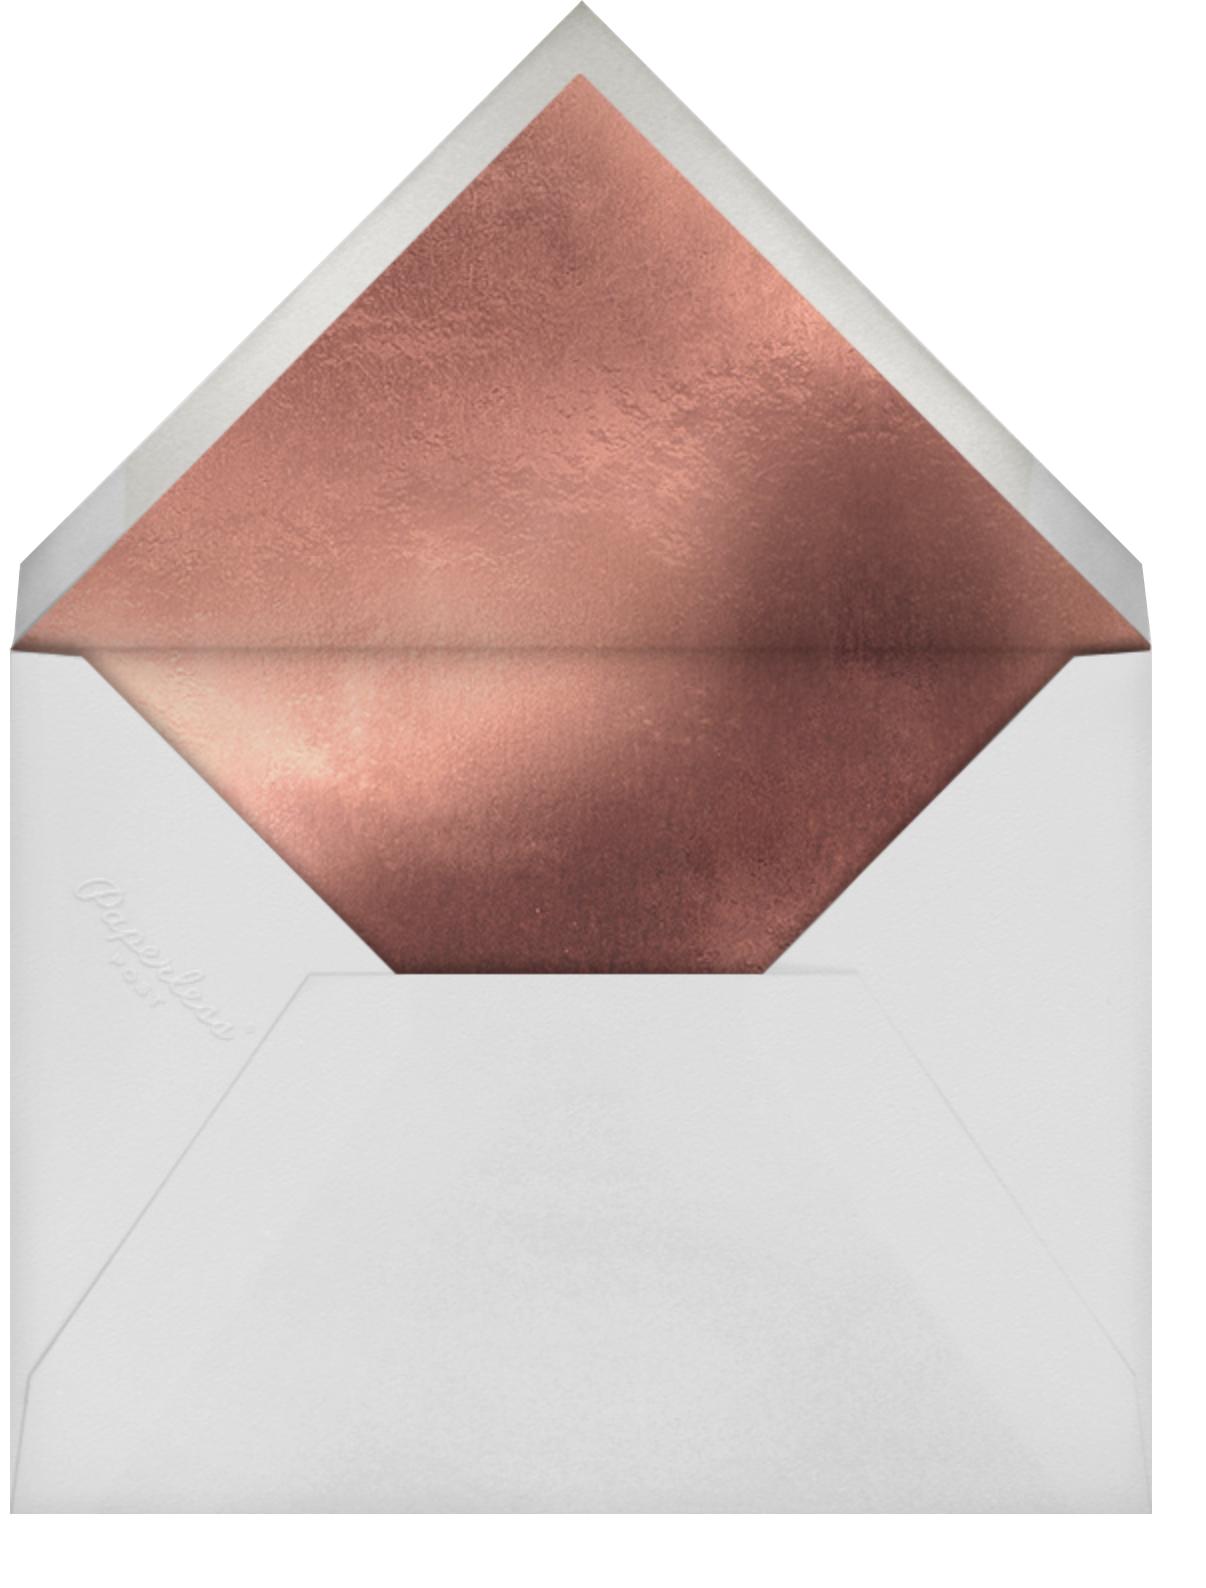 Milestone Moment - Rose Gold - Paperless Post - Adult birthday - envelope back